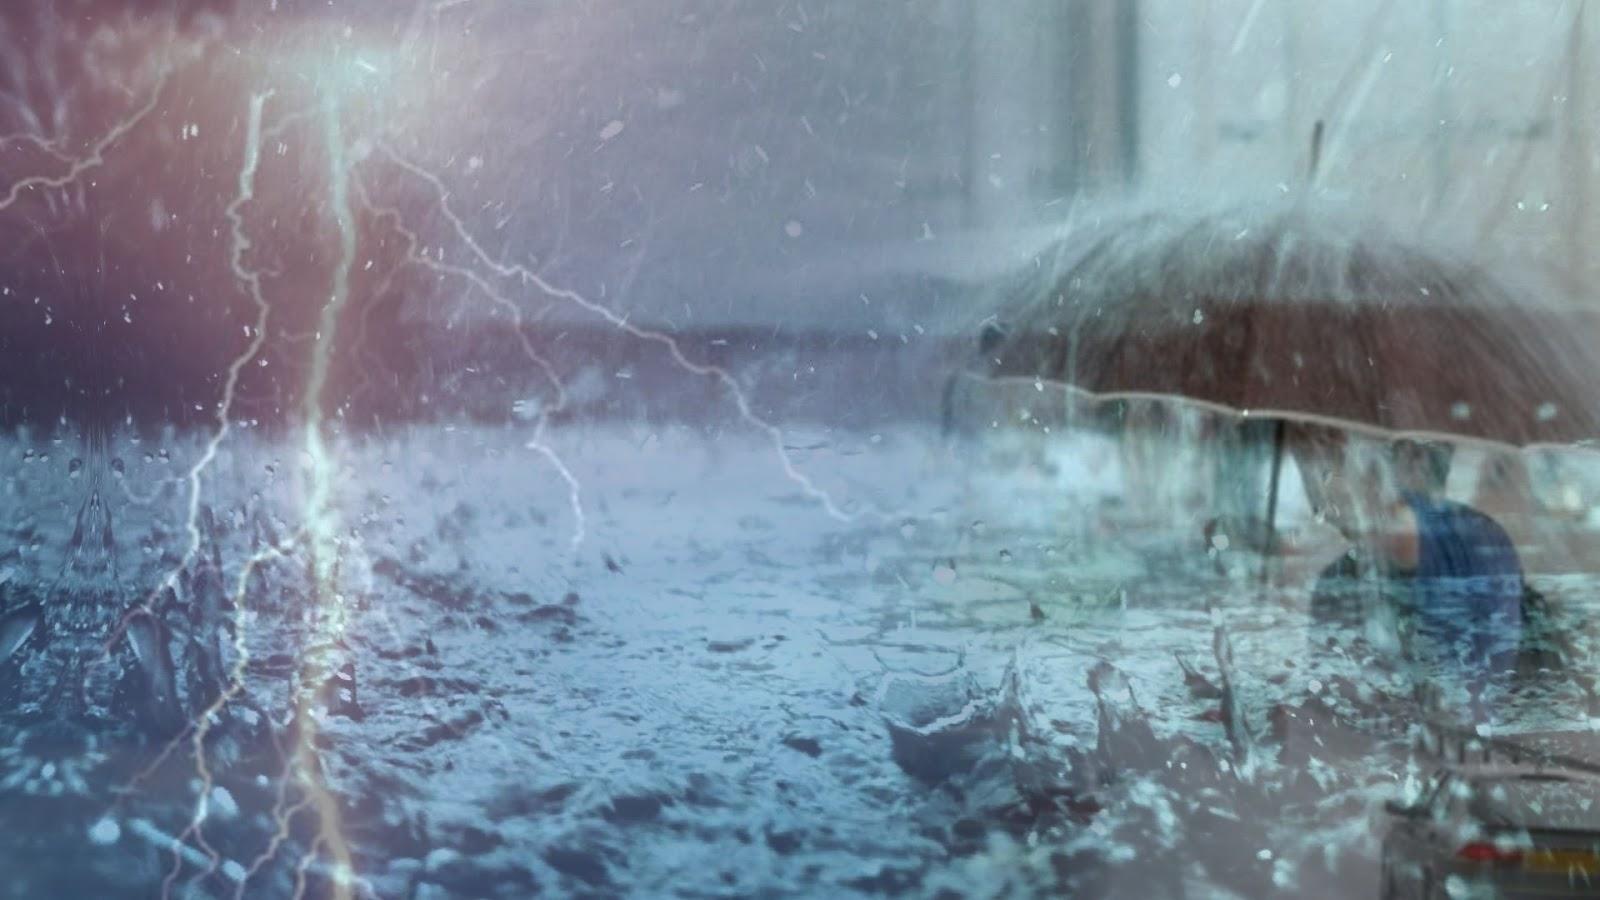 Weather News: Ερχονται καταιγιδες-Ποτε χαλαει ο καιρος..